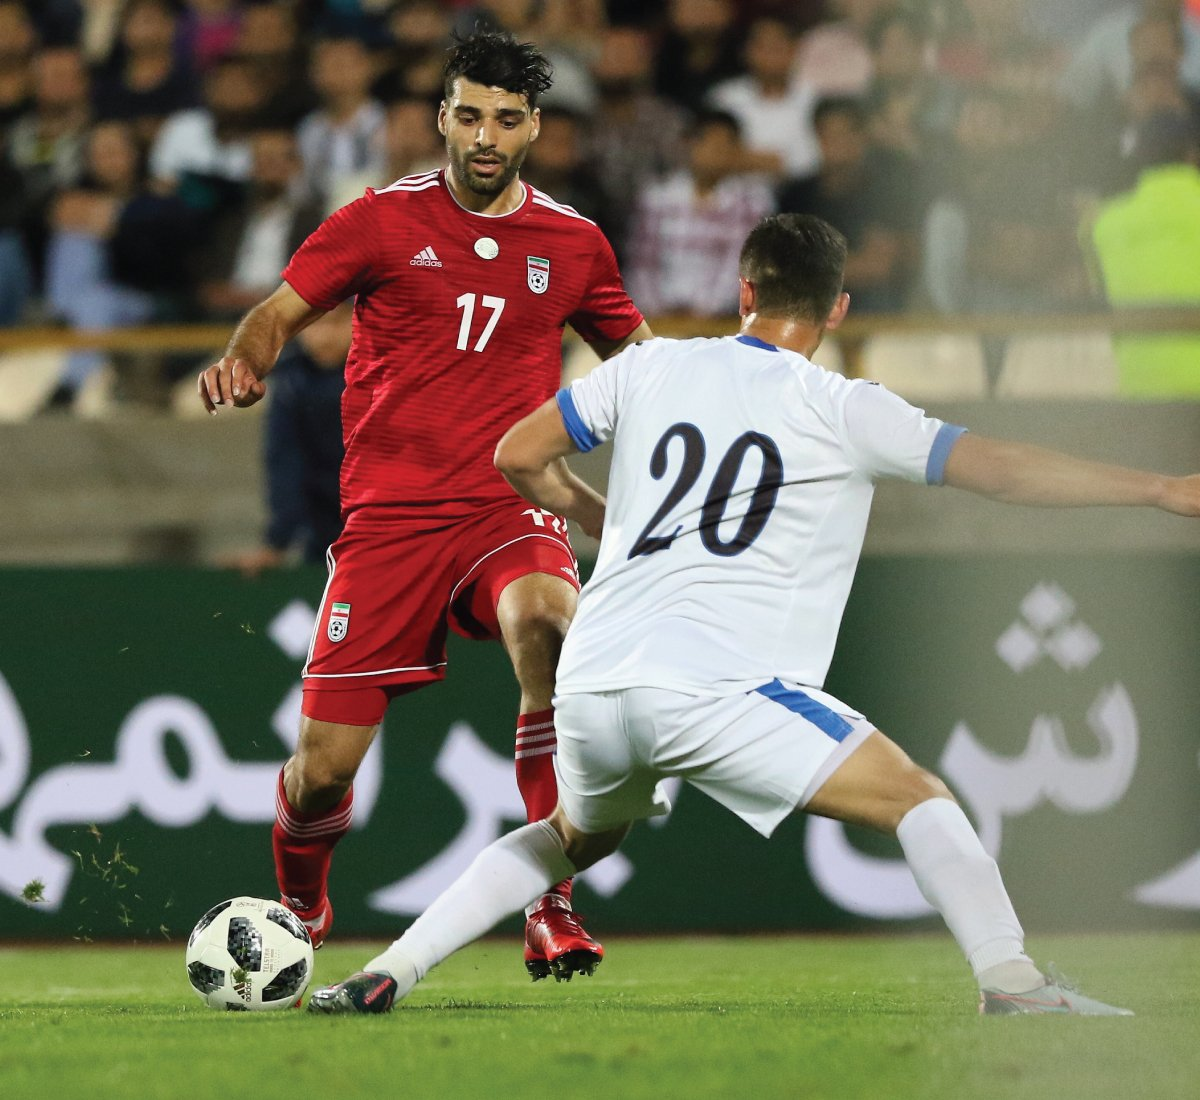 boring-with-nice-detail-adidas-iran-2018-world-cup-away-kit+%25285%2529.jpg